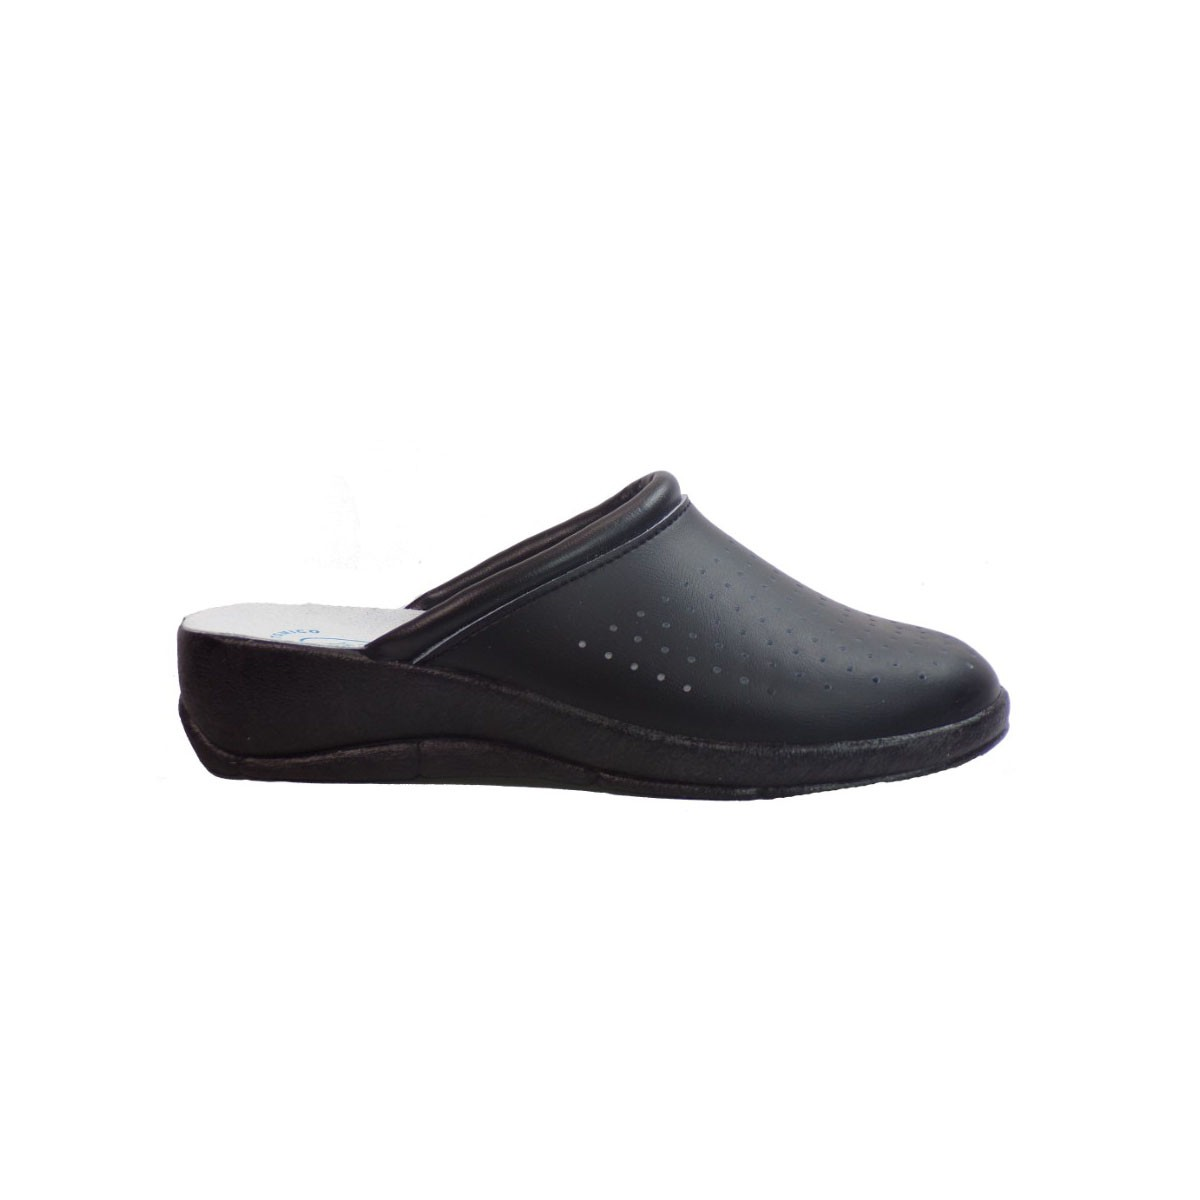 ca9ea140413 Max Relax Γυναικείες Παντόφλες 400 S Μαύρο – IShoeStore